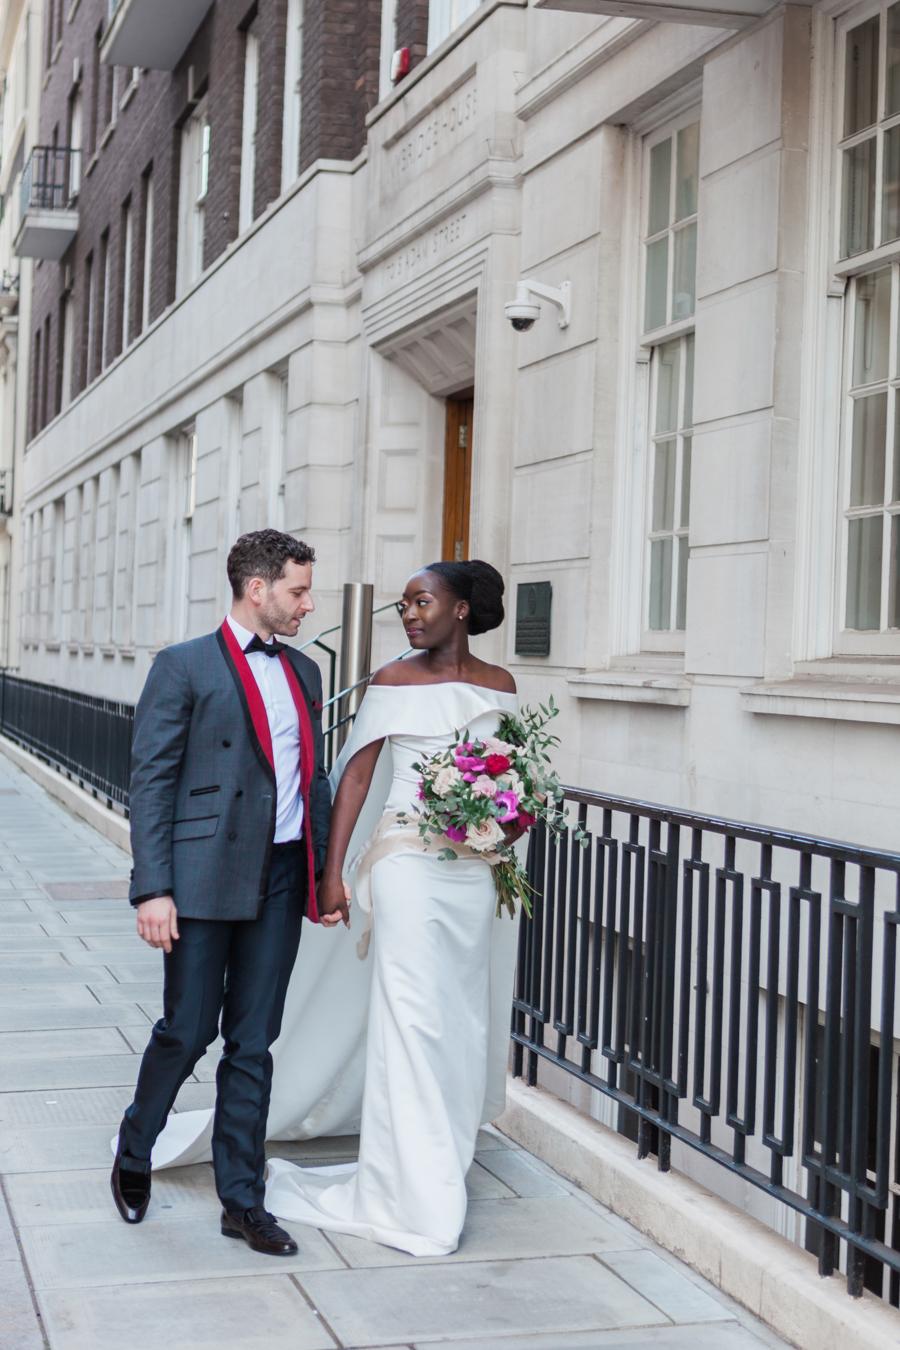 Breathtakingly beautiful - diversity wins in this stunning RSA London wedding editorial! (10)